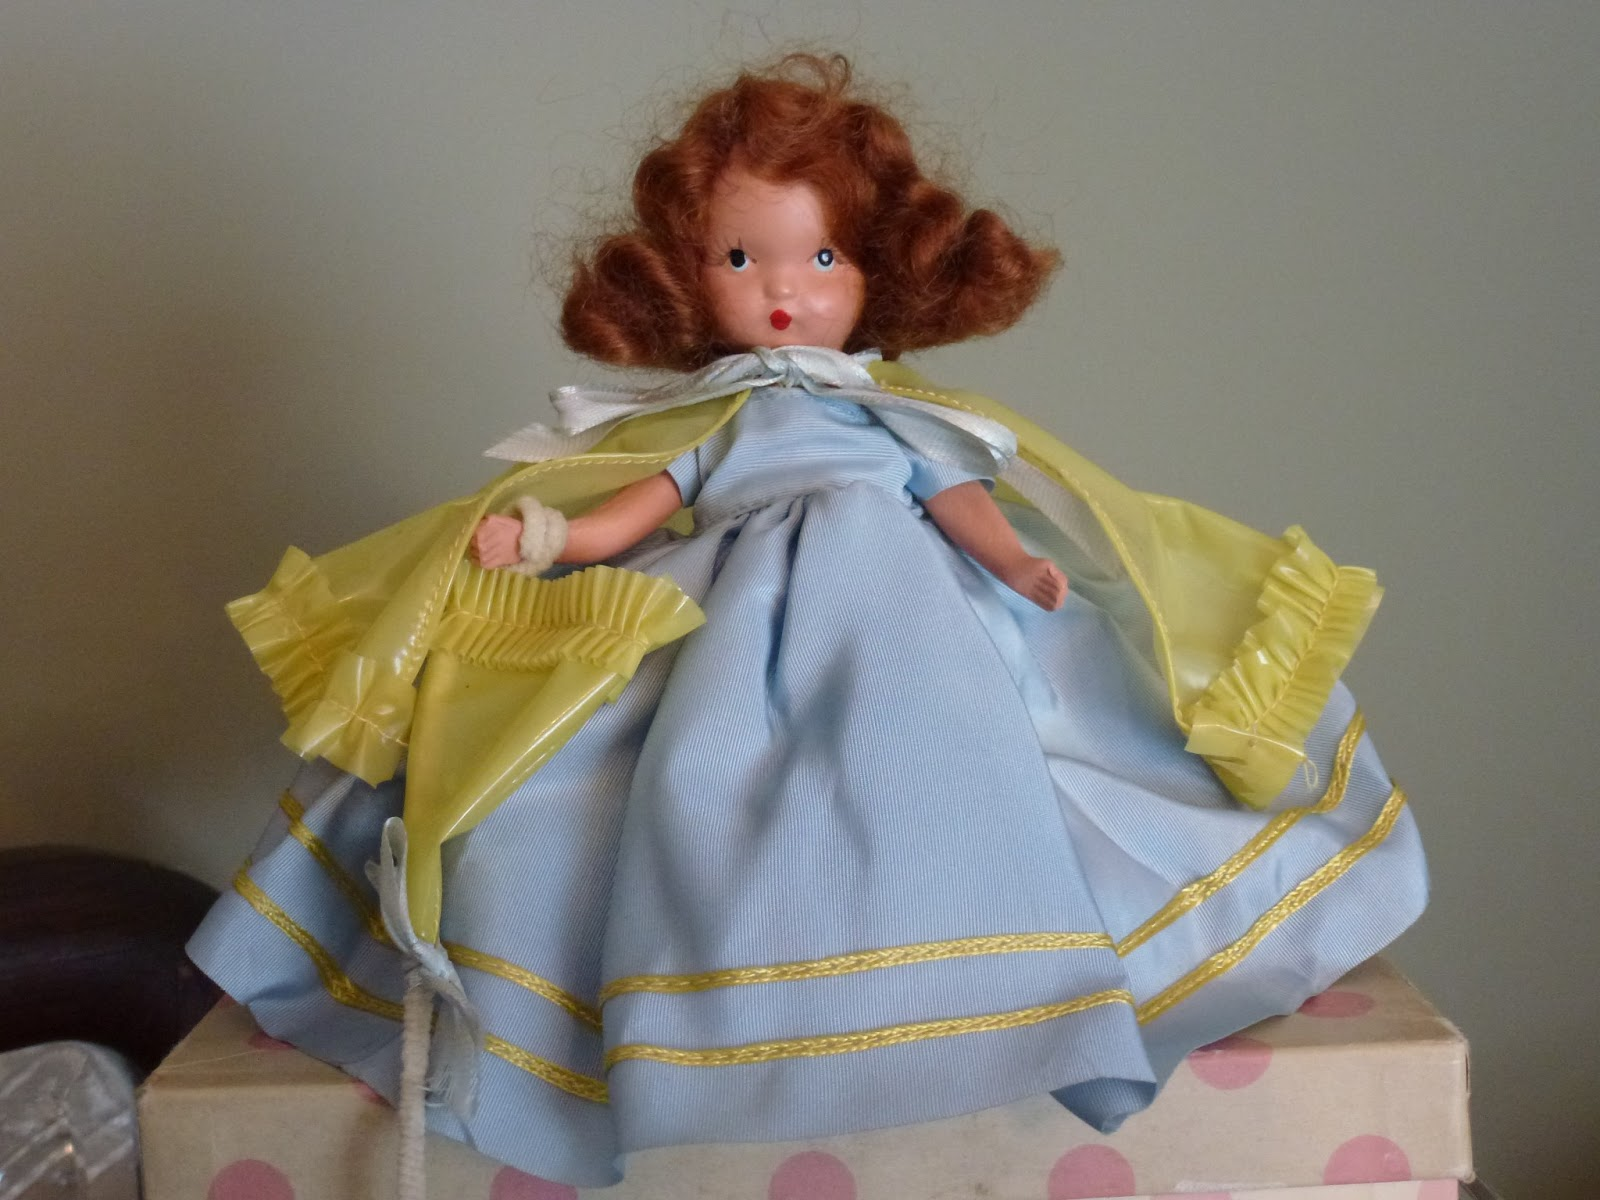 Frozen legs stamped storybook dolls usa on back white muslin pantalets